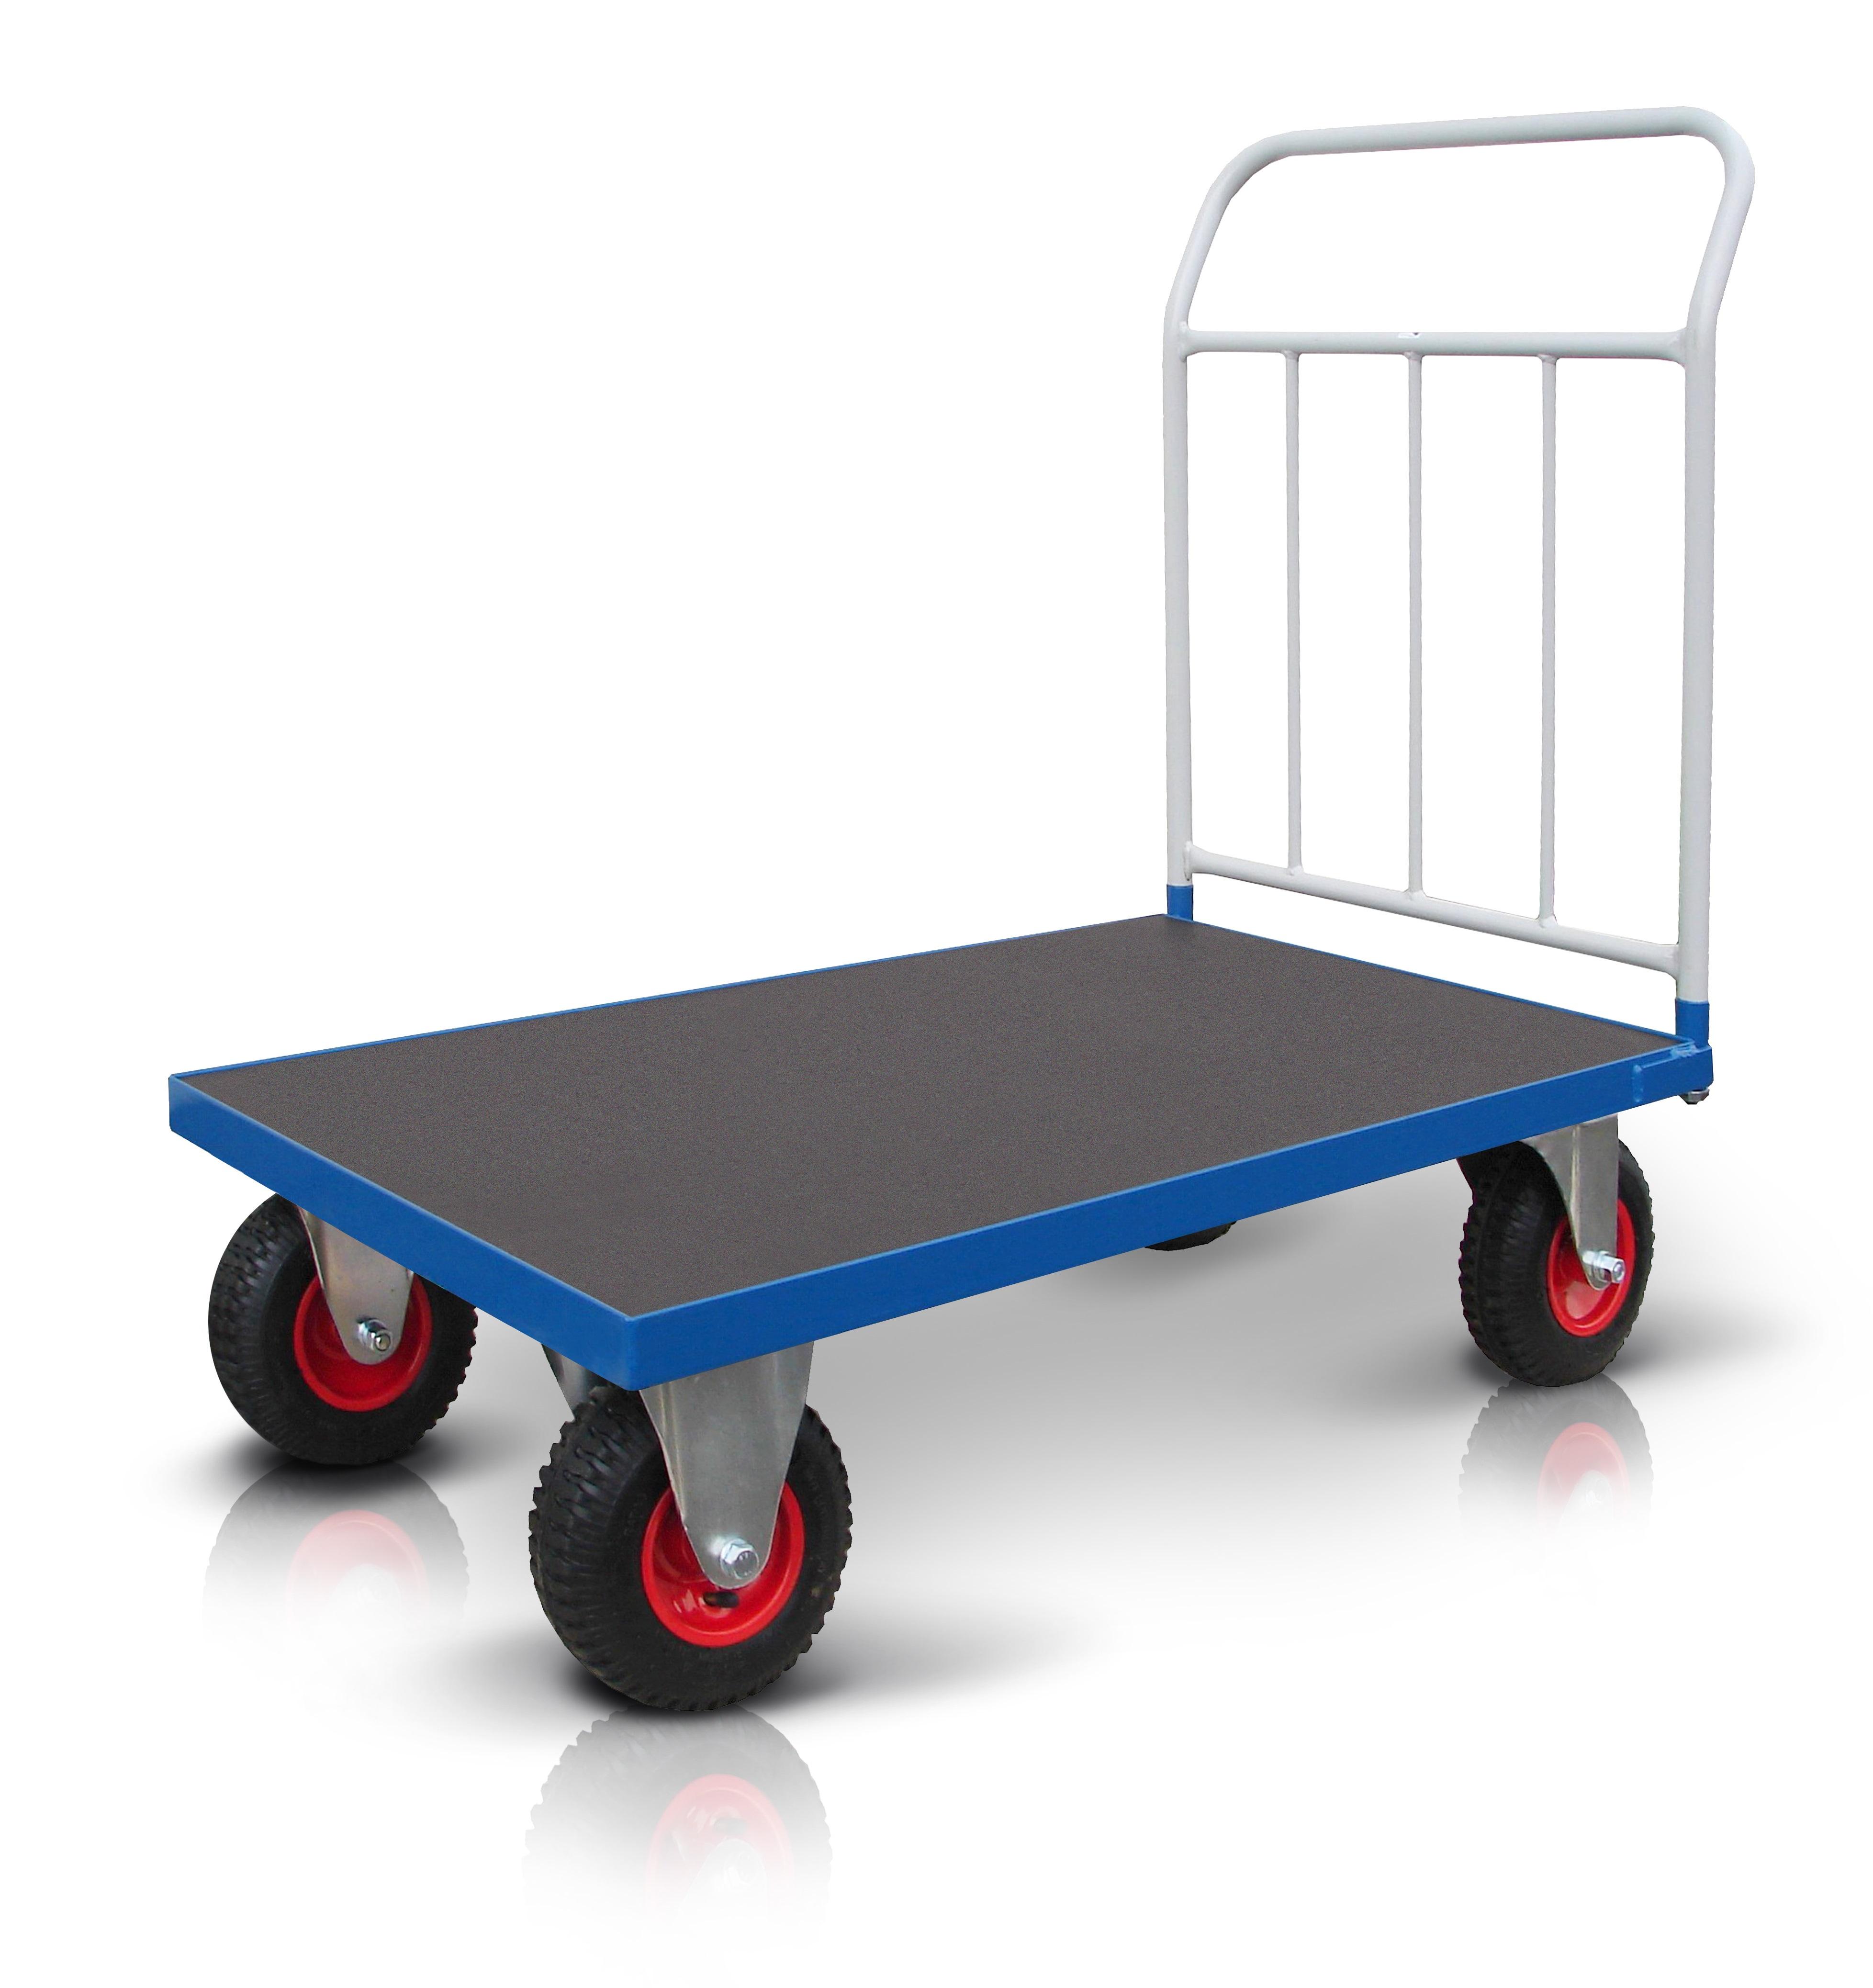 Plošinové vozíky PROFI s nafukovacími koly